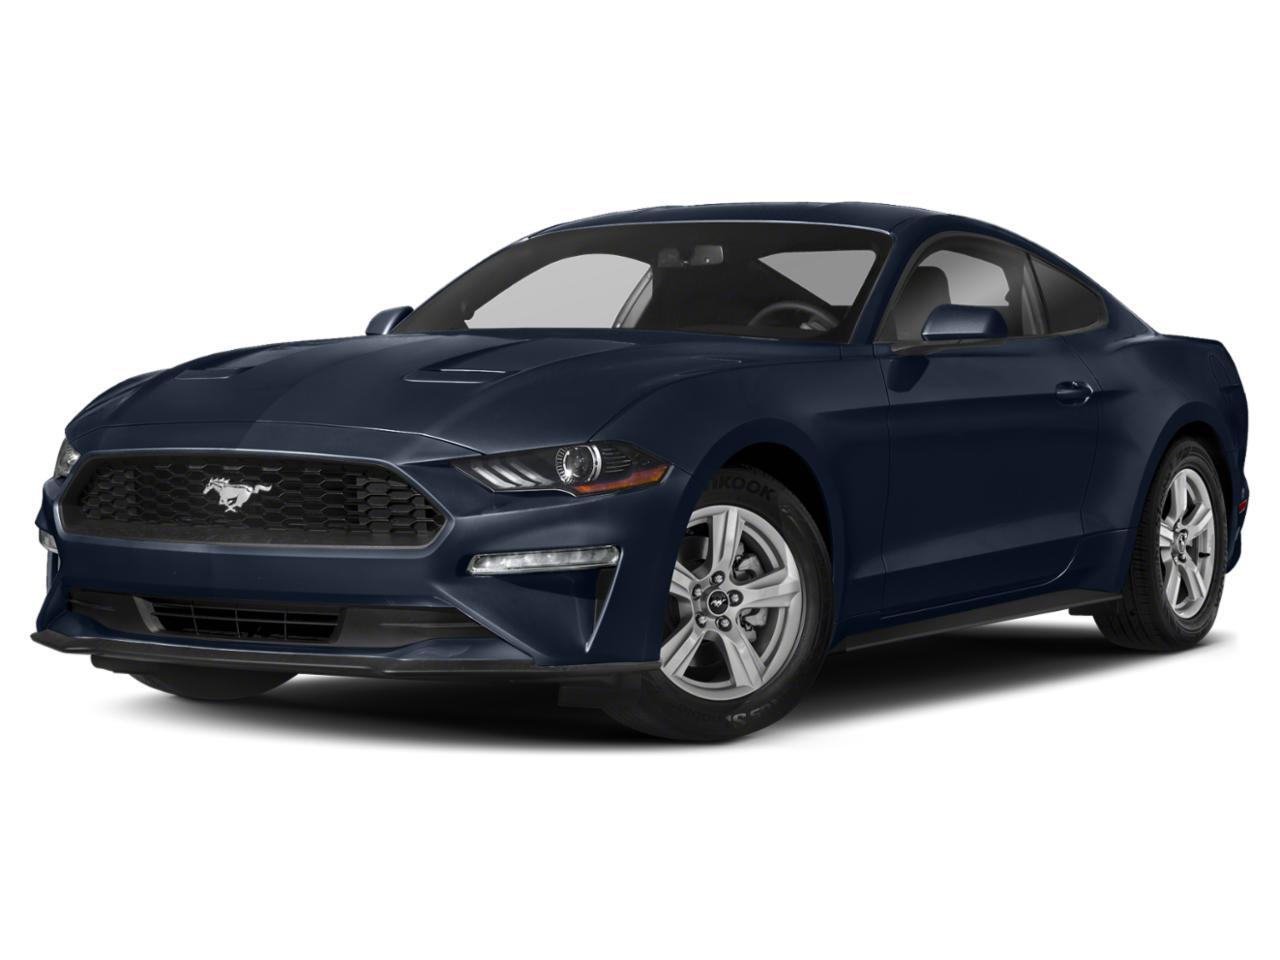 Kona Blue Metallic 2020 Ford Mustang ECOBOOST 2dr Car Winston-Salem NC